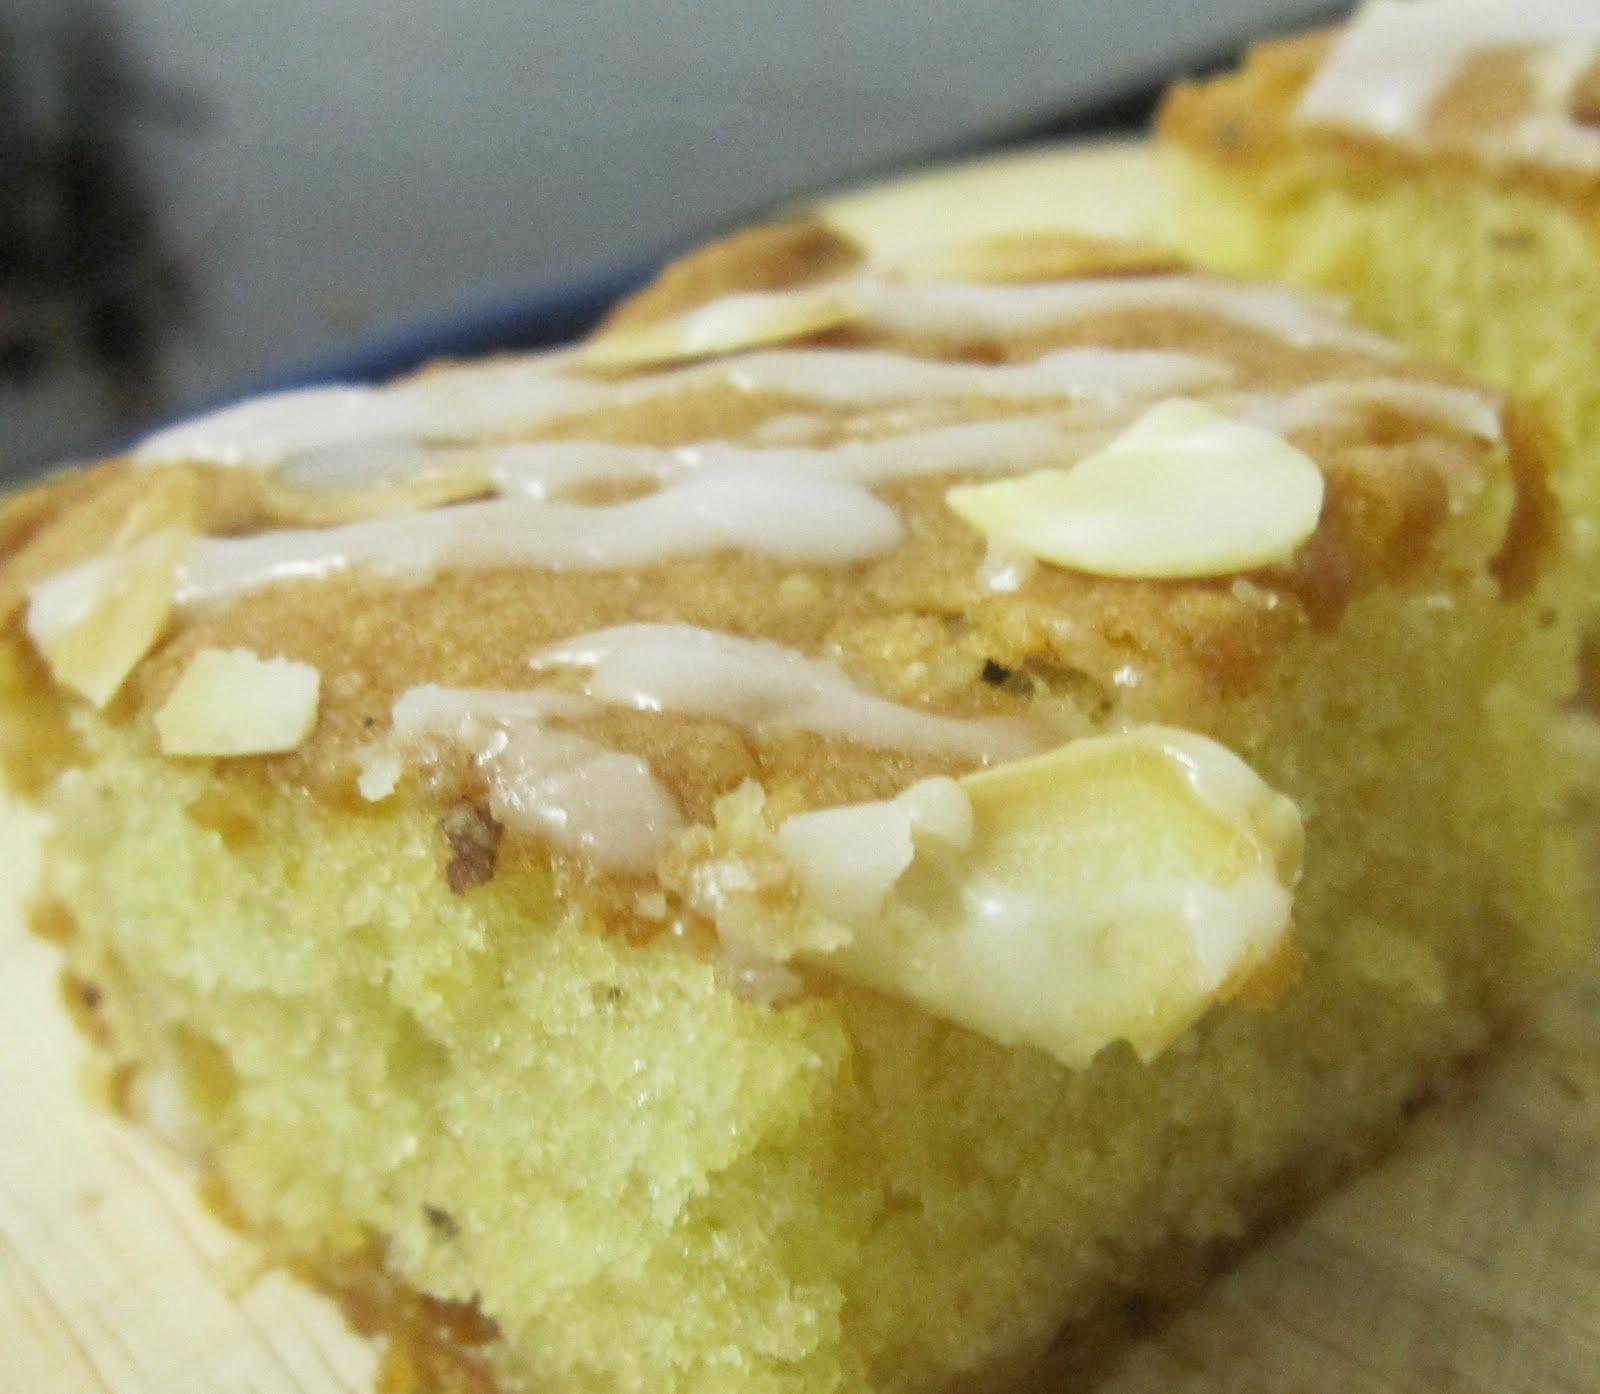 Lipstick & Marzipan: Almond & Marzipan Sponge Cake